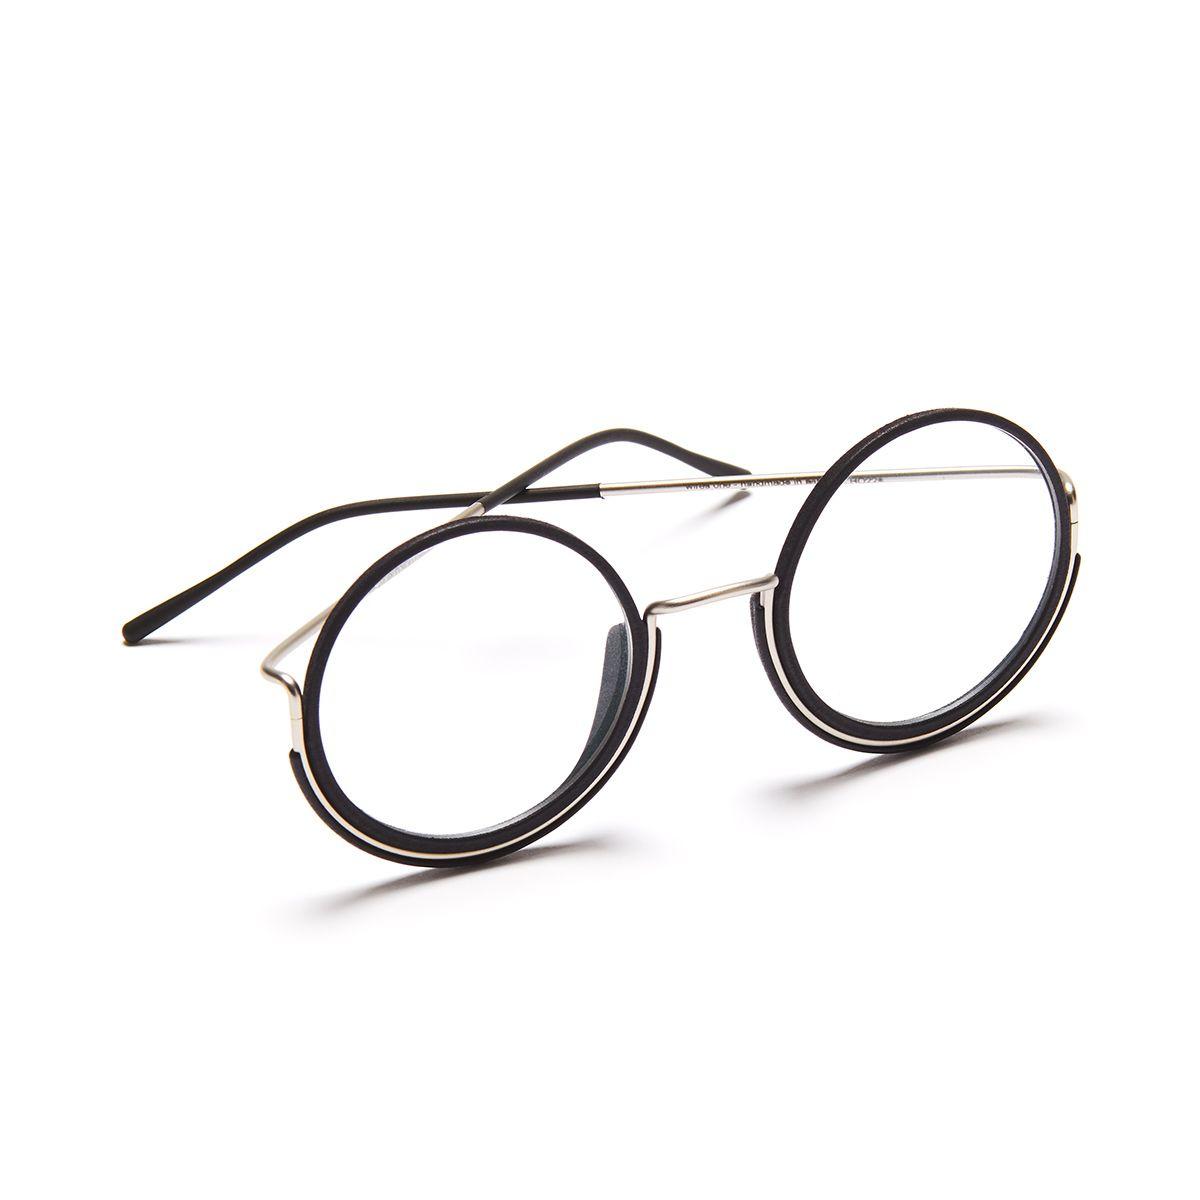 Wires 180º Silver/Black